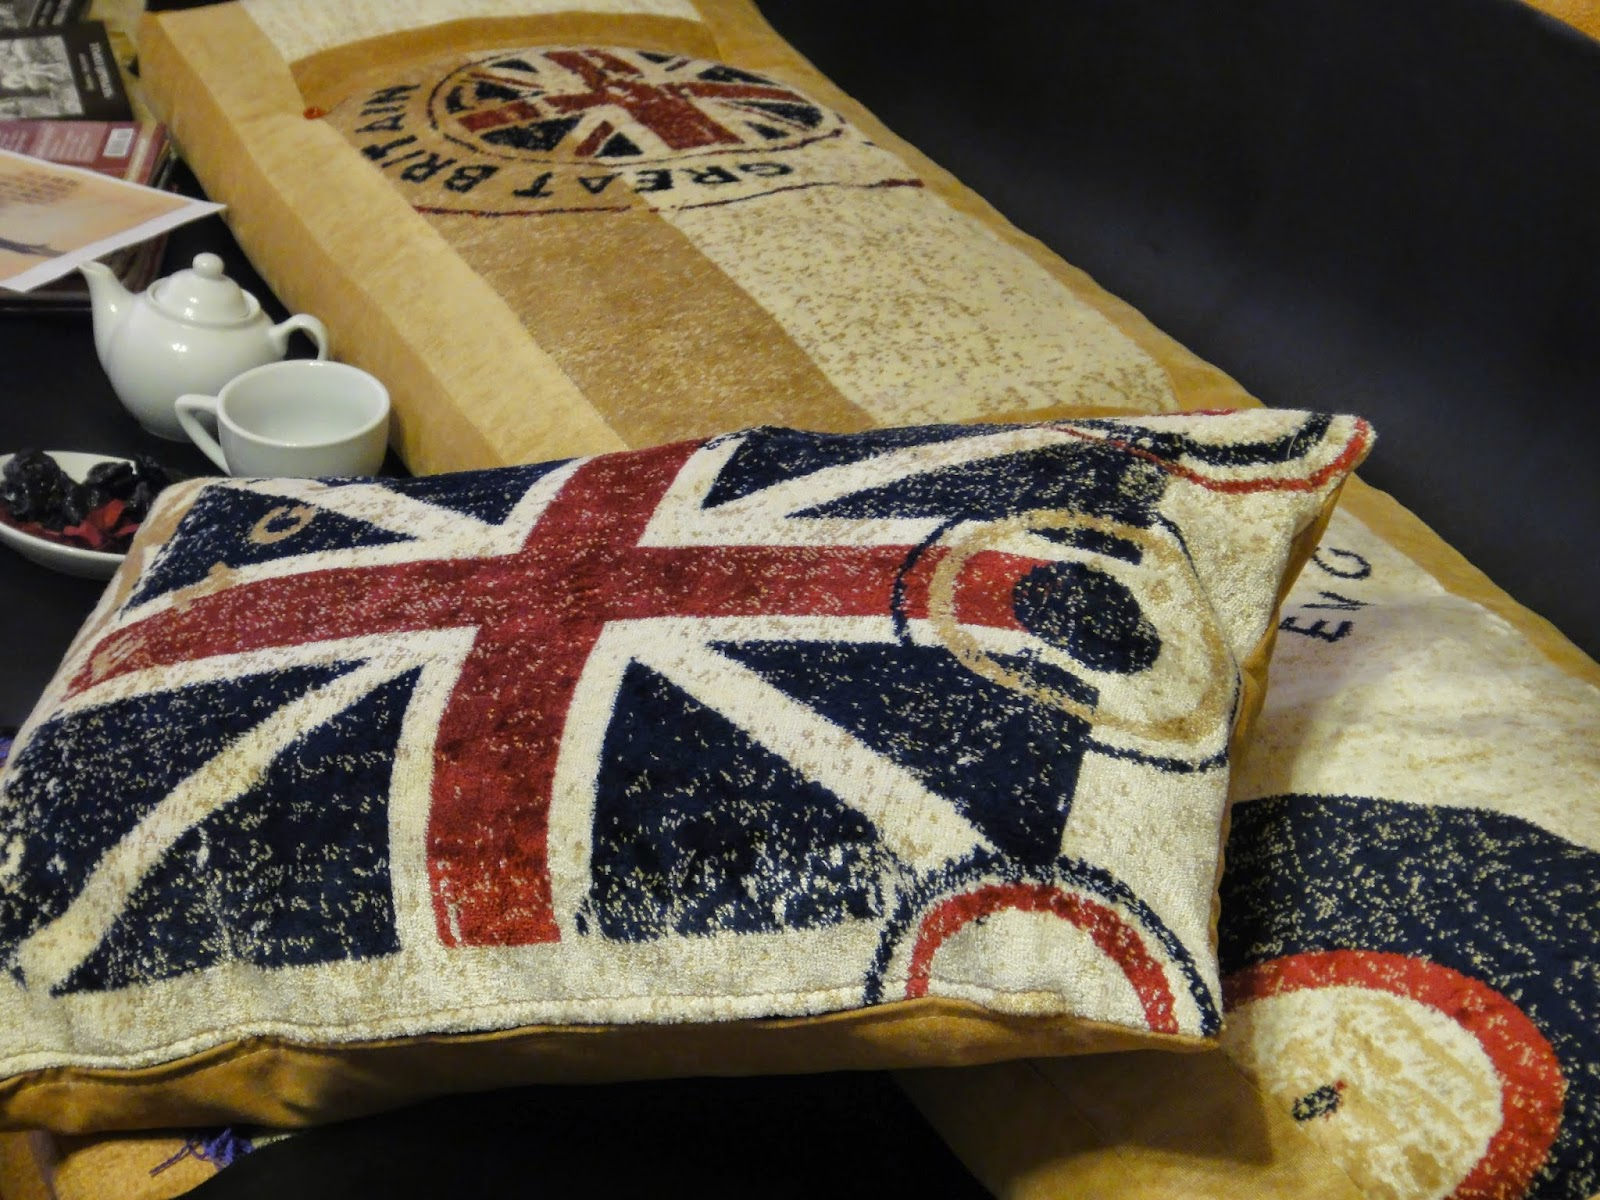 диванная подушка британский флаг - подарок подростку